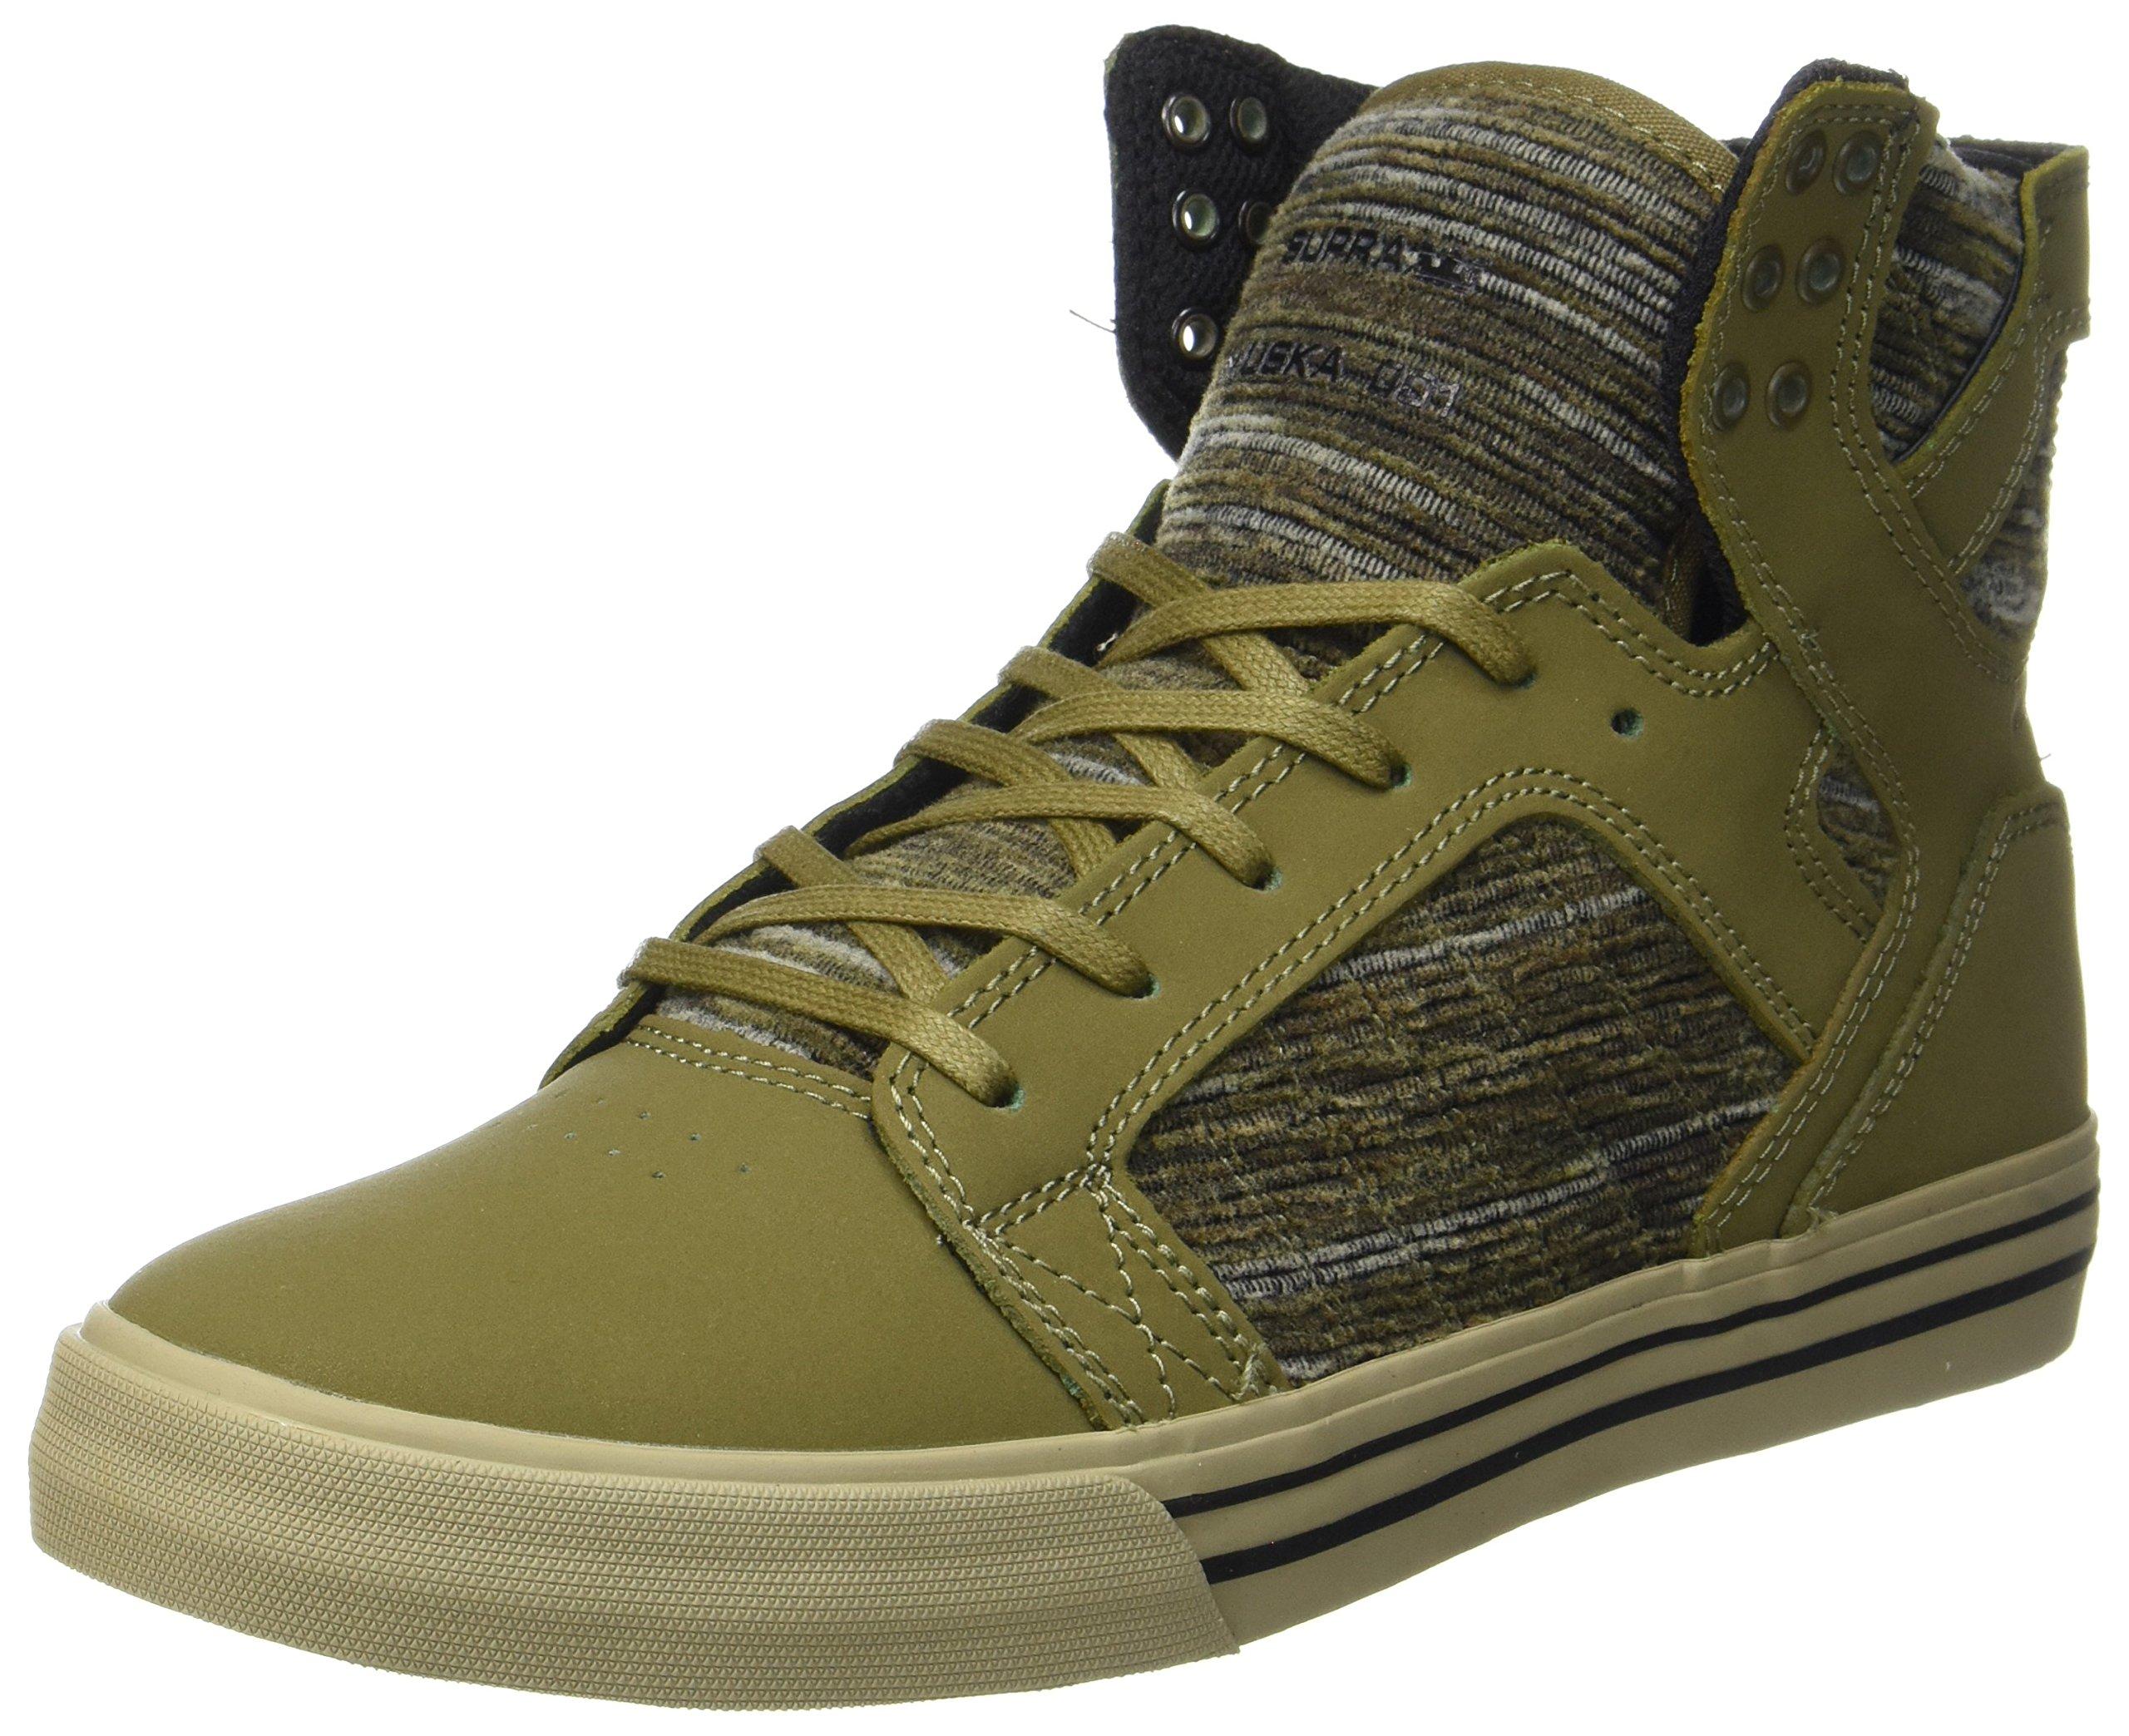 Supra Mens Skytop 2017 Shoes Size 11 Olive Multi-Sage